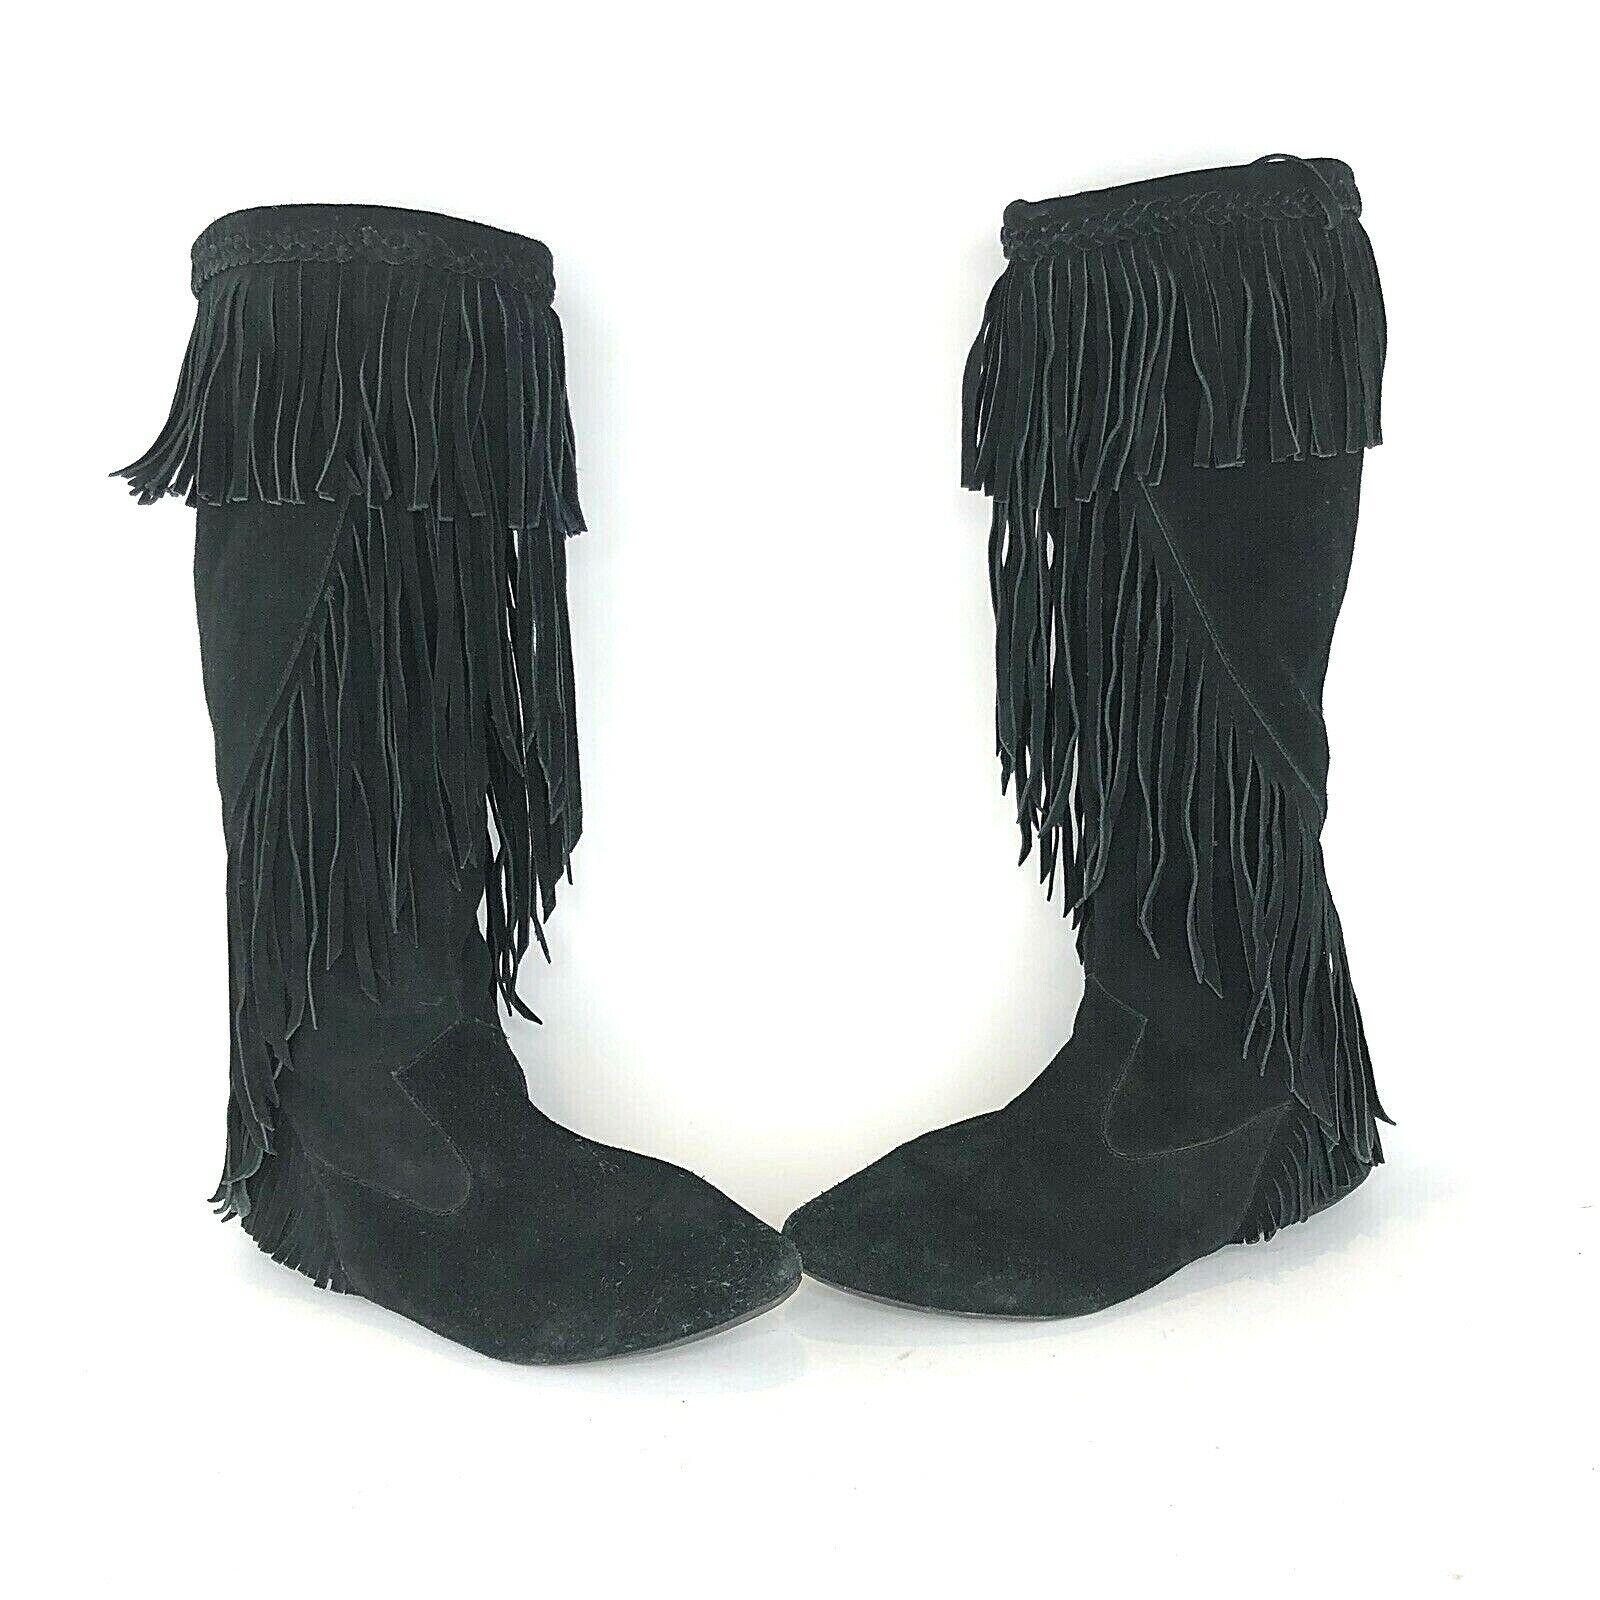 Sam Edelman Womens Size 9 M Utah Black Suede Fringe Flats Pull On Boots